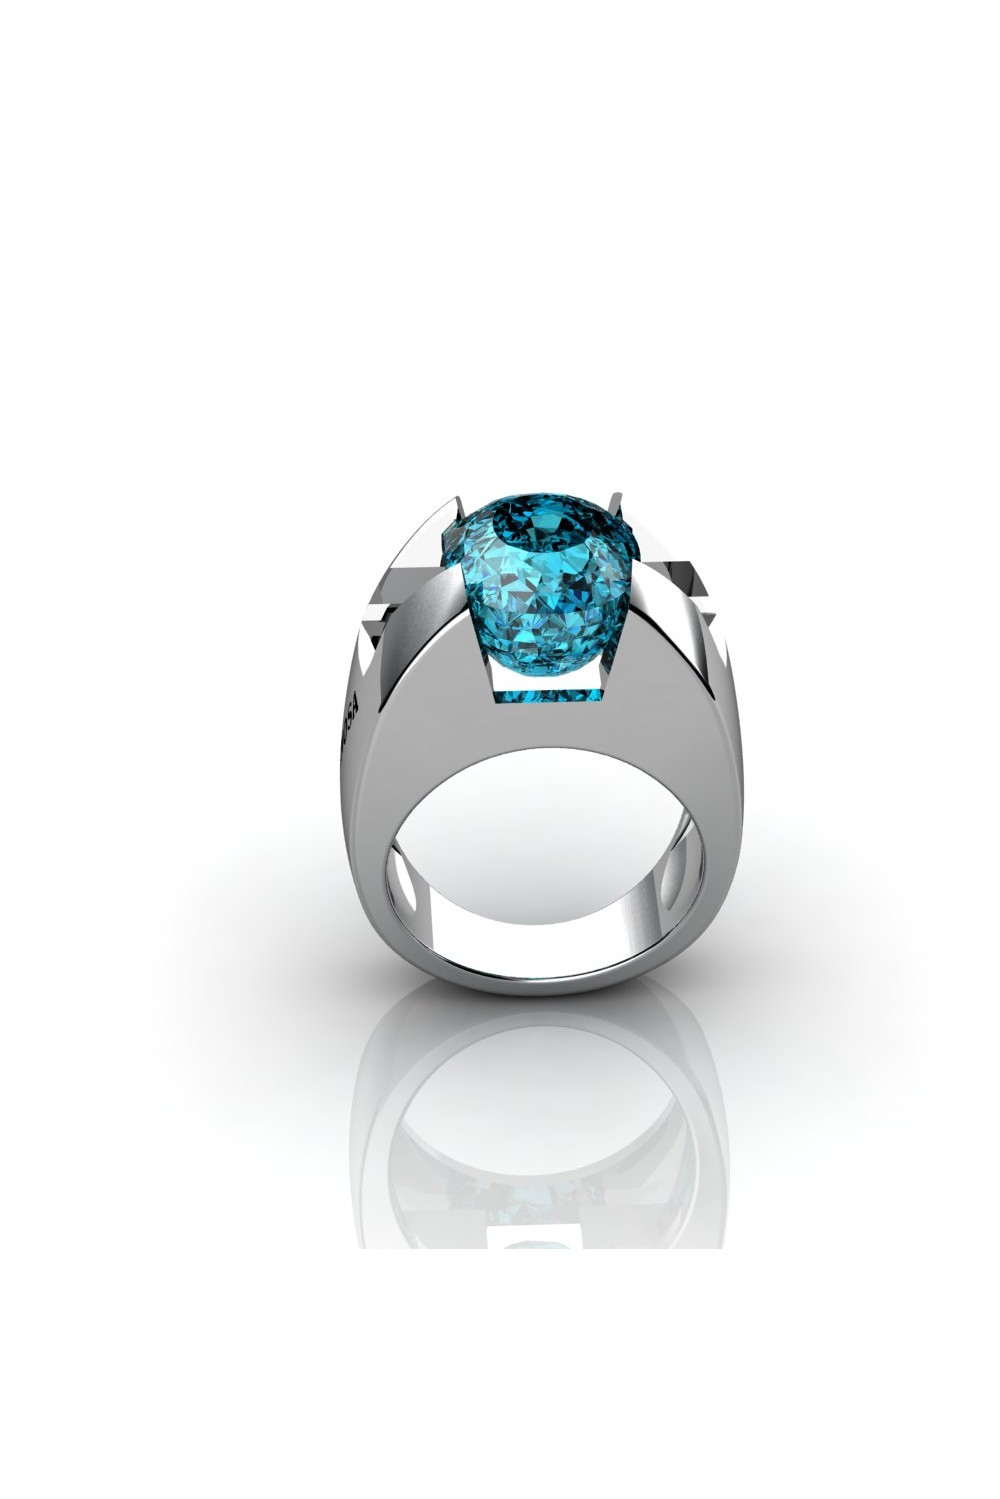 Blue Topaz White Gold Rings Jewellery In M 225 Laga Marbella